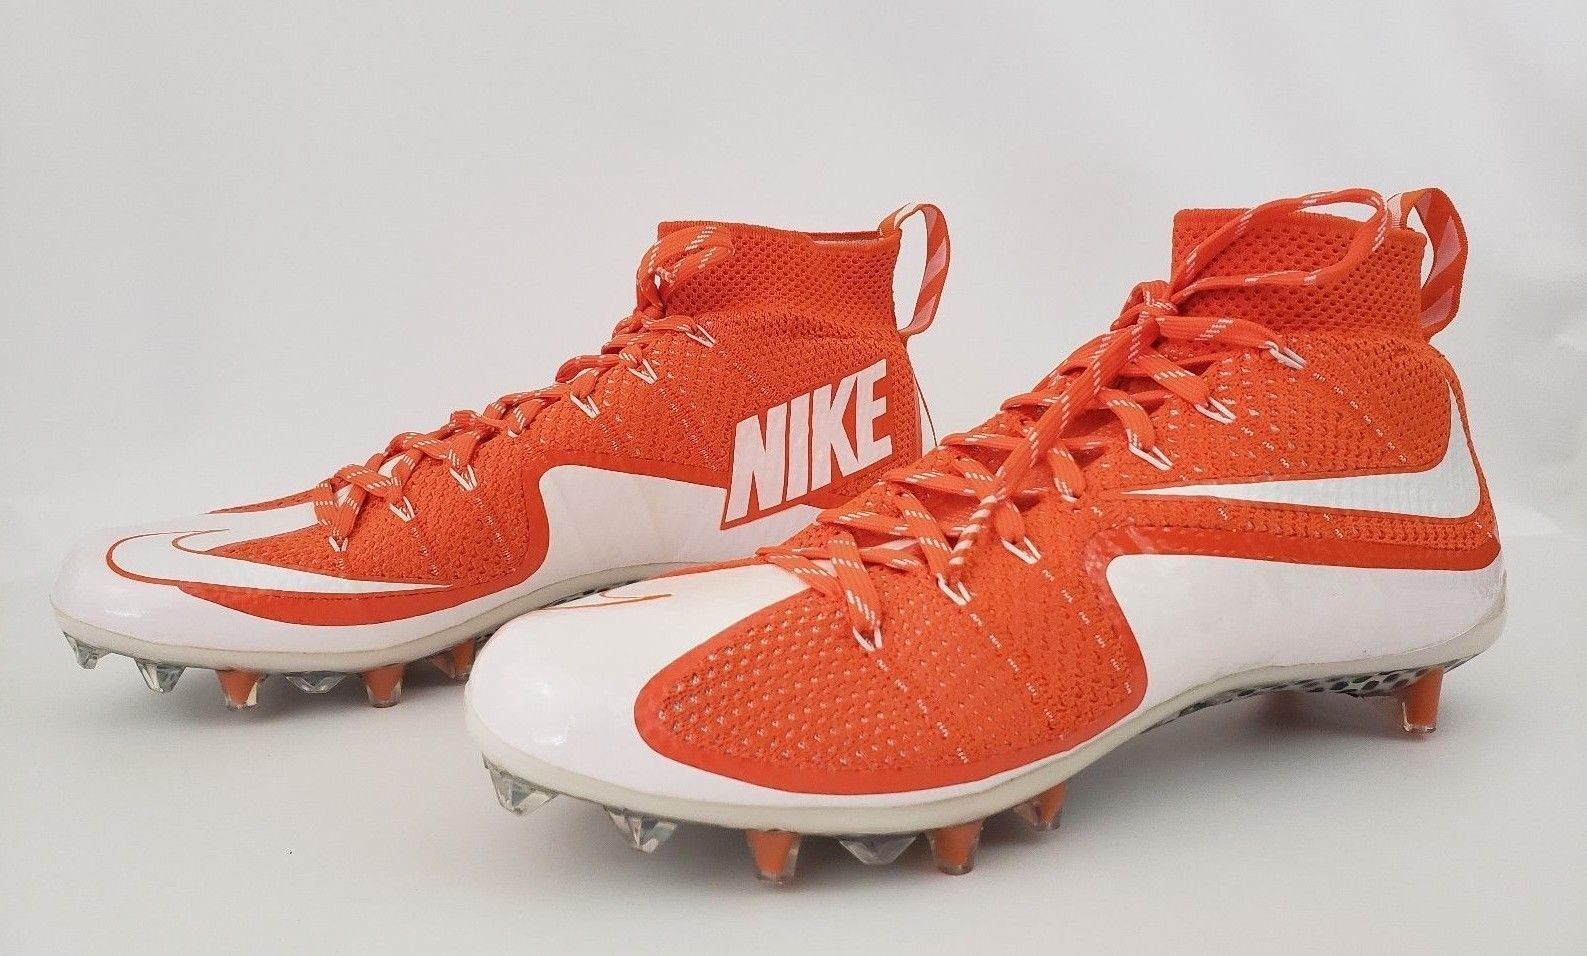 Nike Vapor Untouchable TD Football Cleats Men's 10 orange White 698833-811